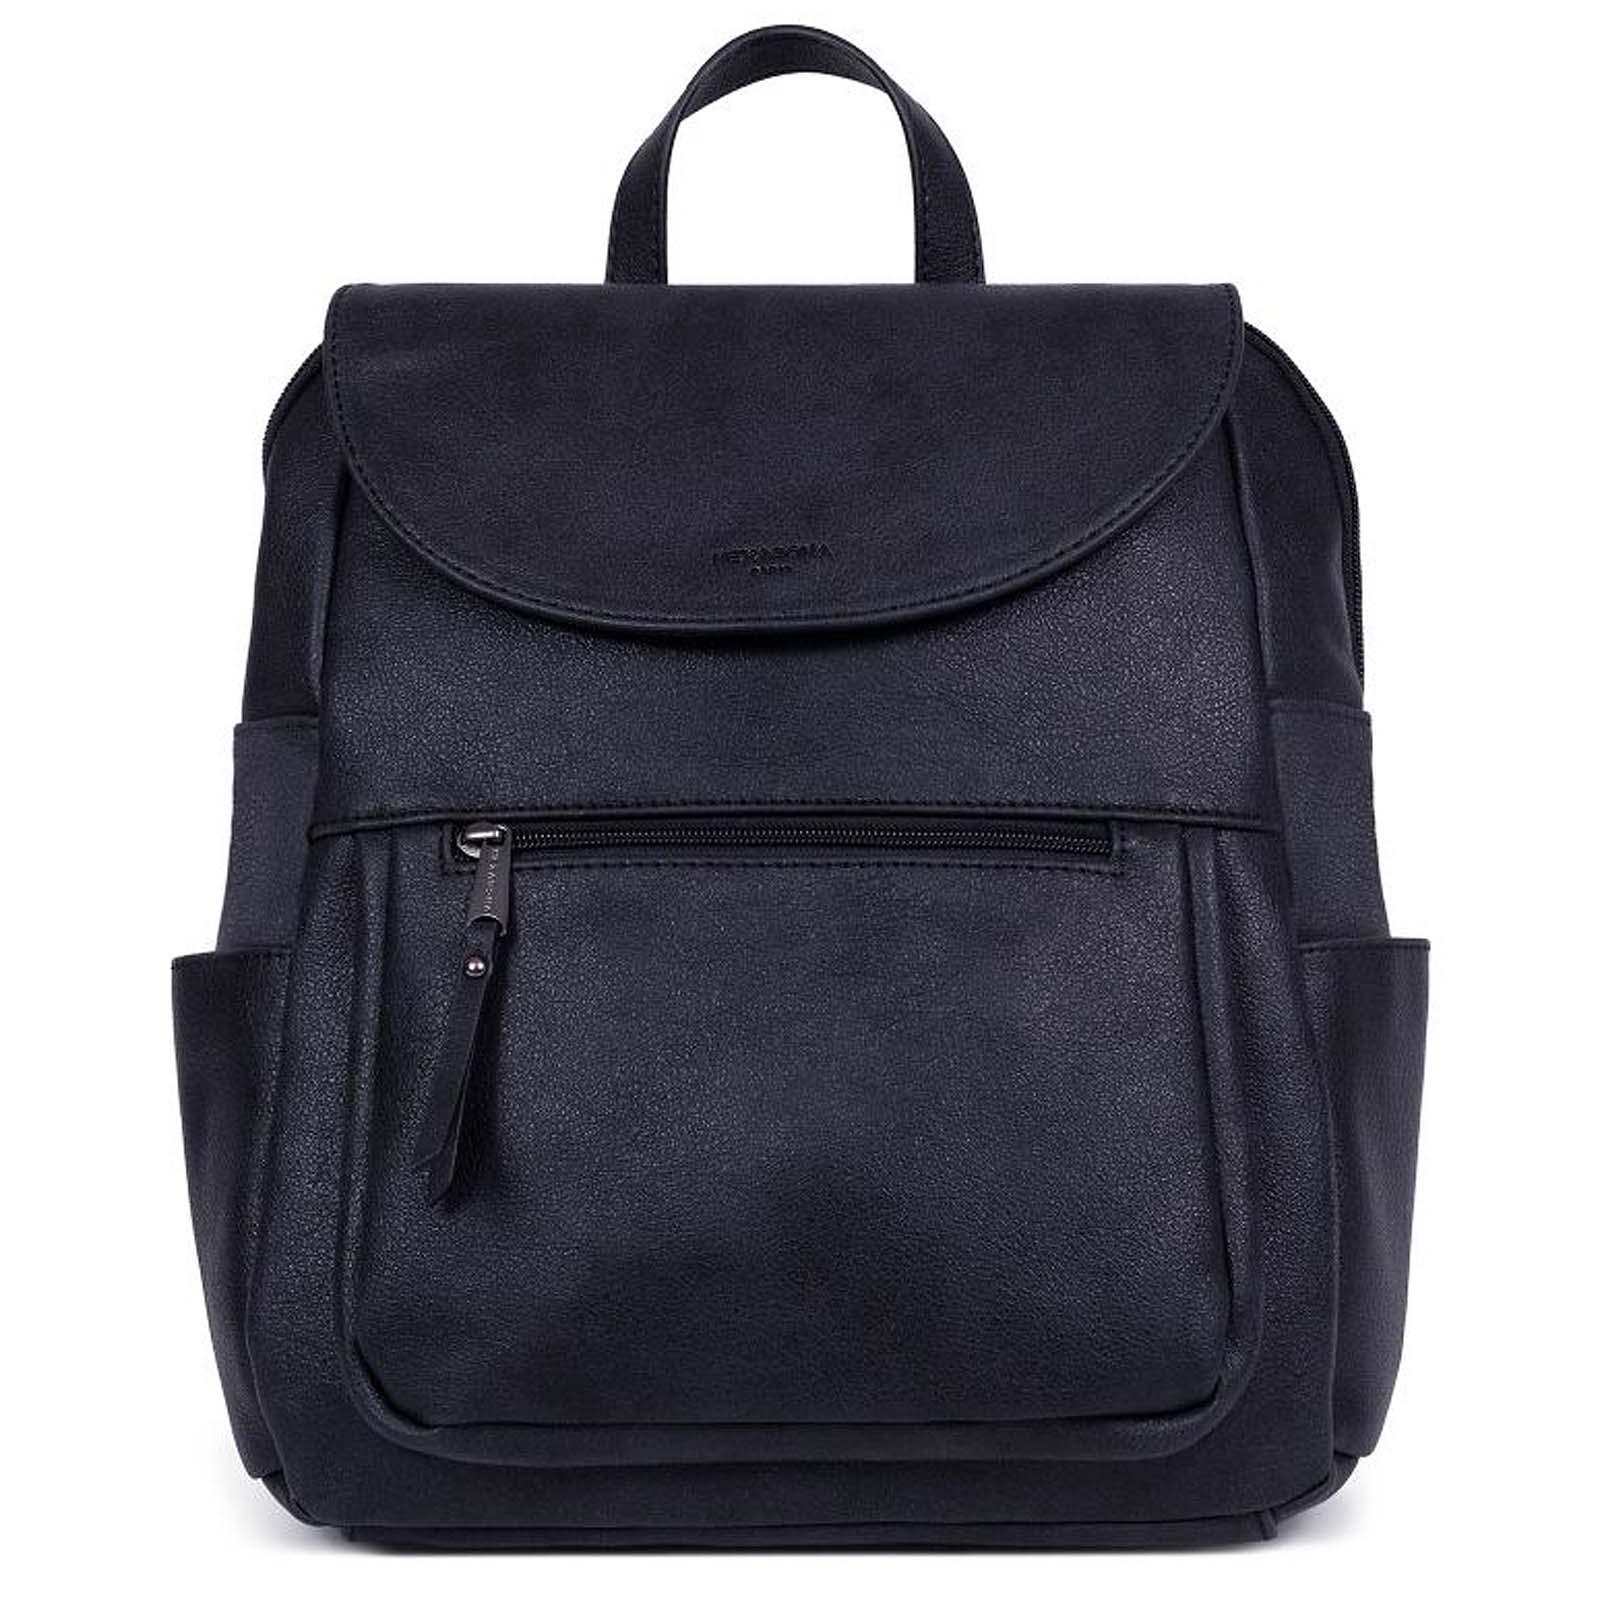 Dámský batoh černý - Hexagona Dahoman